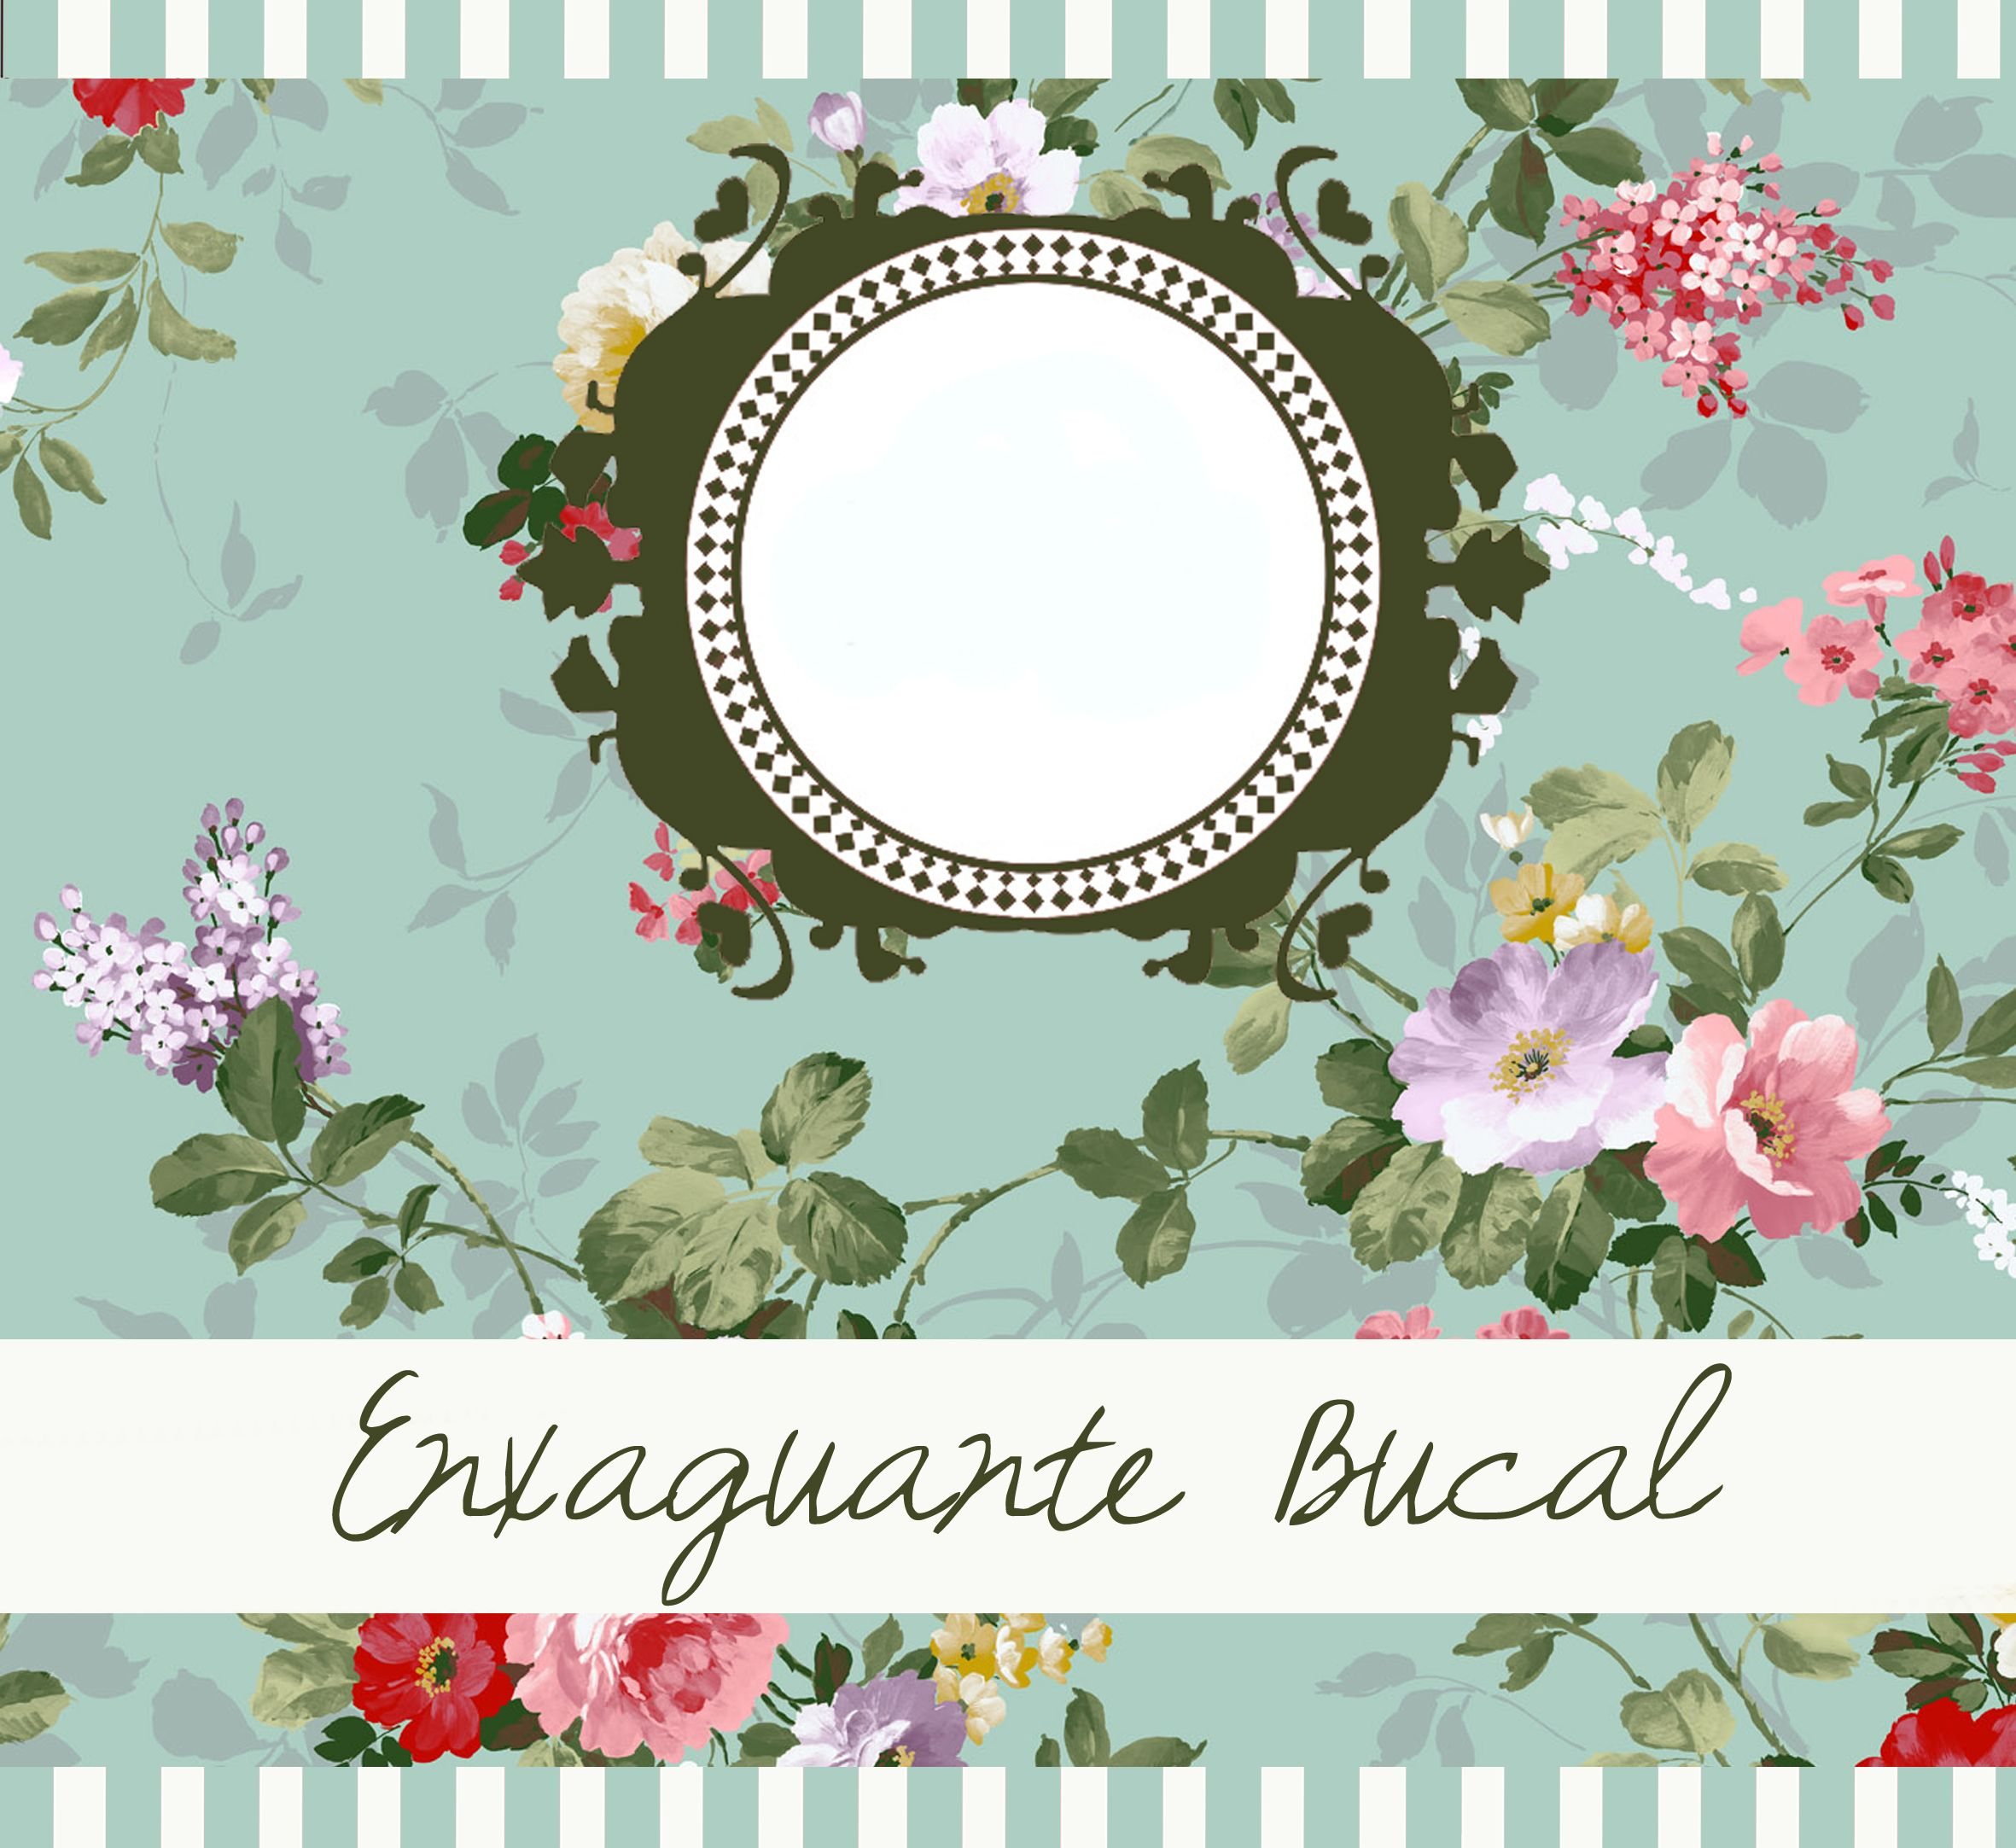 Kit Banheiro Para Casamento Goiania : Diy kit toilette green affair http marionstclaire